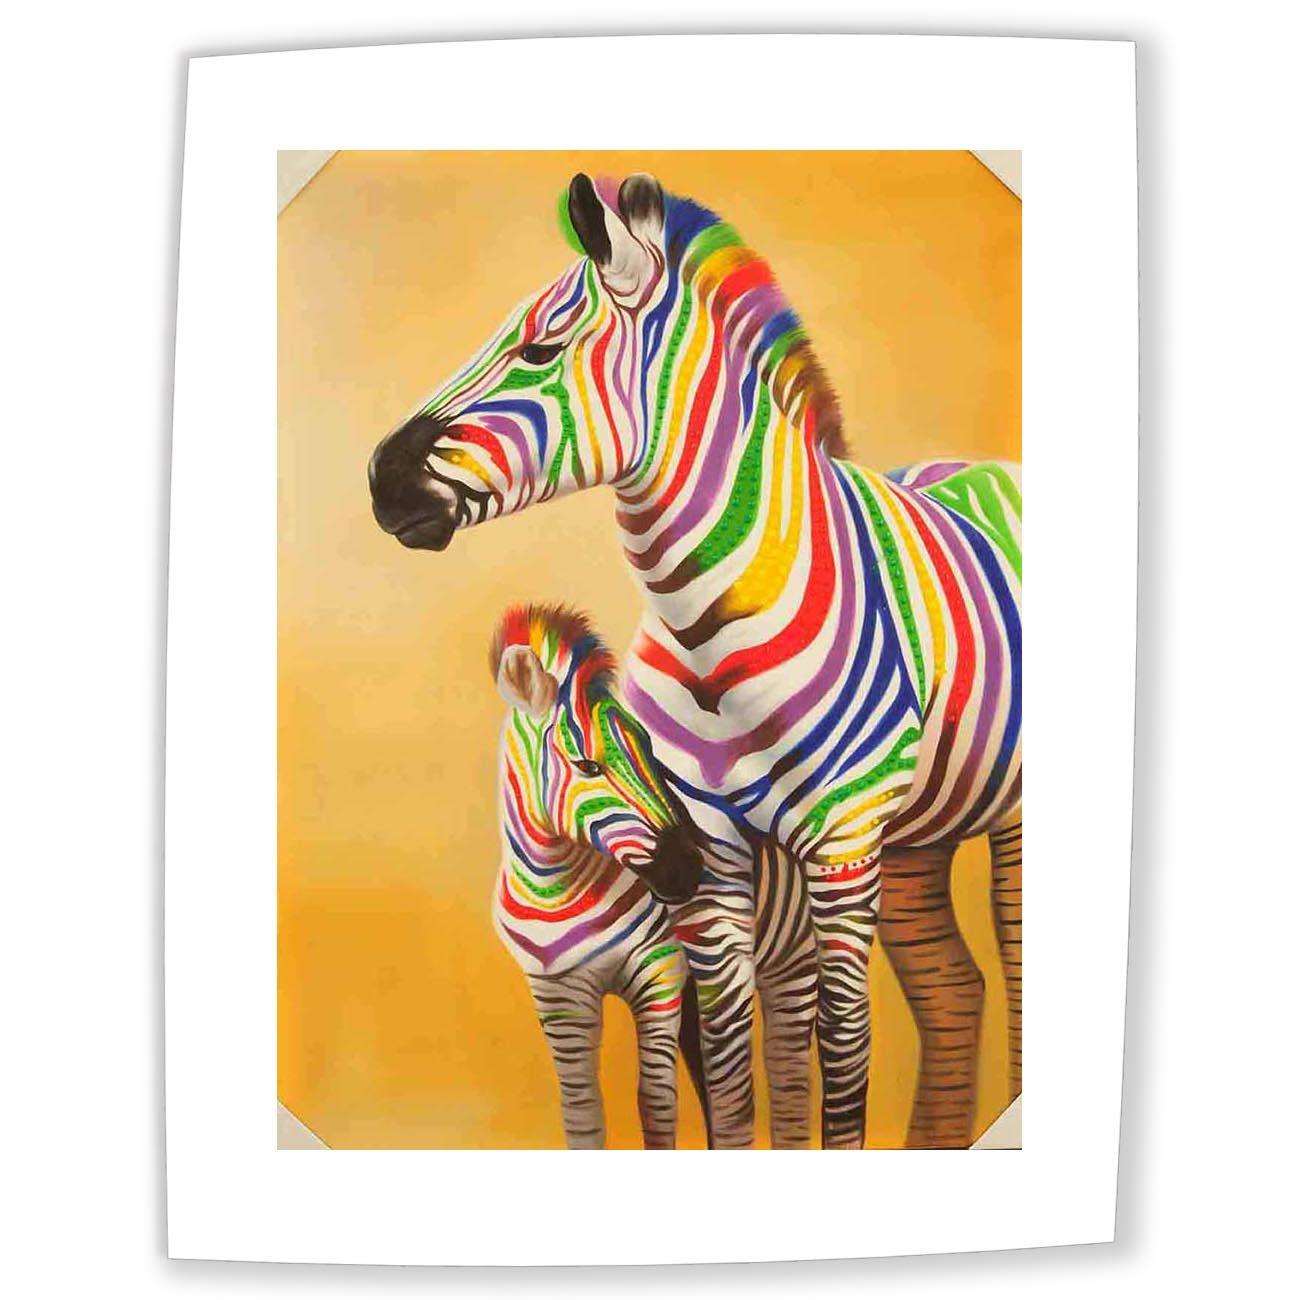 Cuadro sobre Lienzo - Dos Cebras En Colores Multi Pinturas Al Óleo Pared Impresións - 40X55 cm: Amazon.es: Hogar